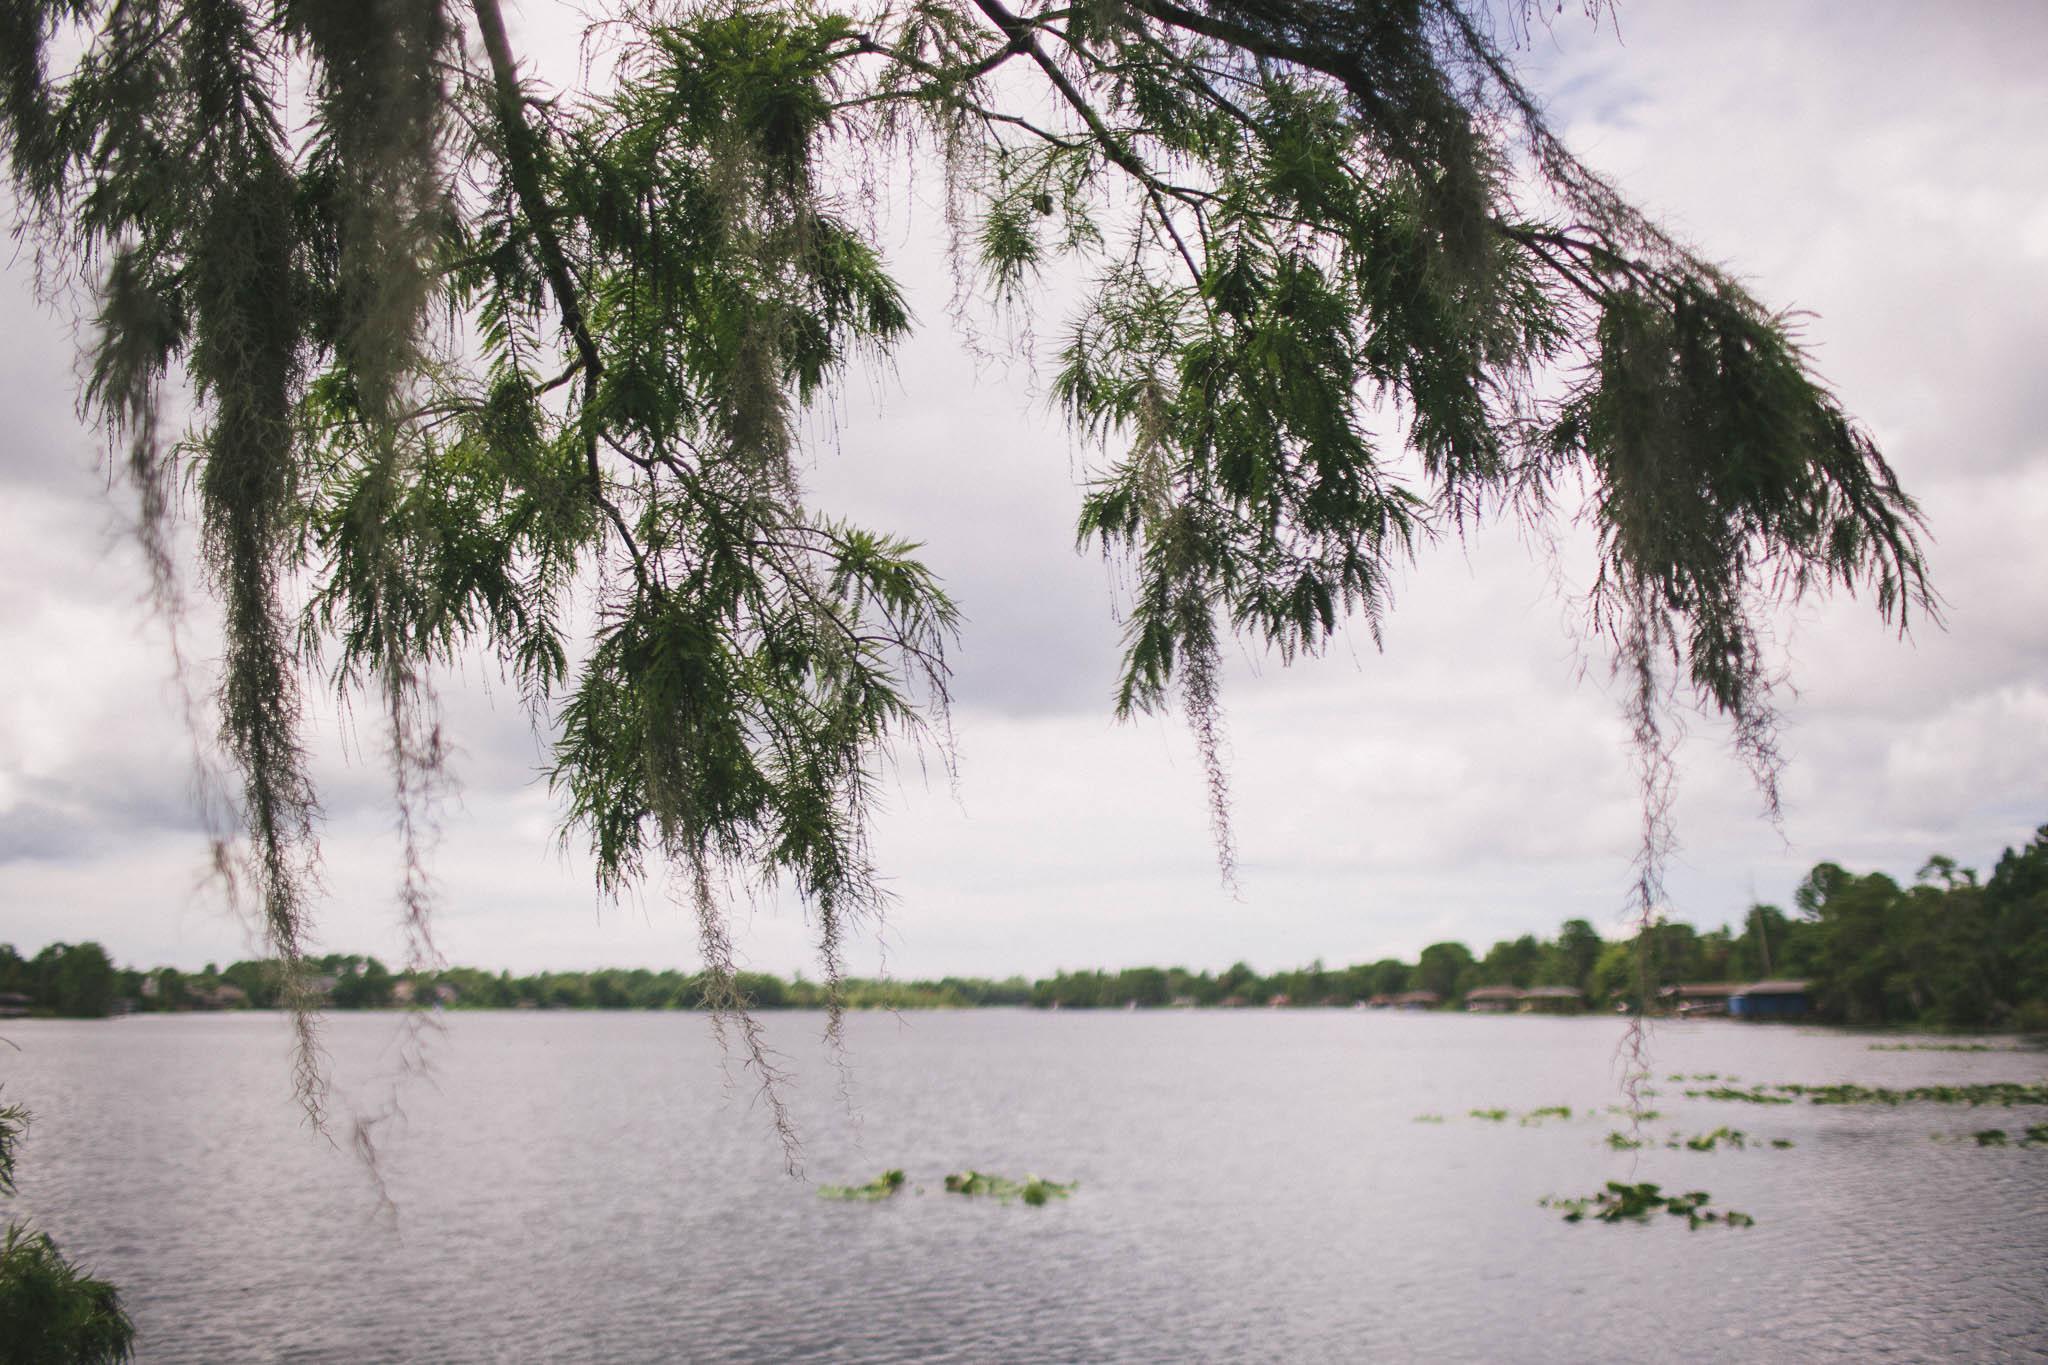 Florida-Lorraine-Yeung-9.jpg